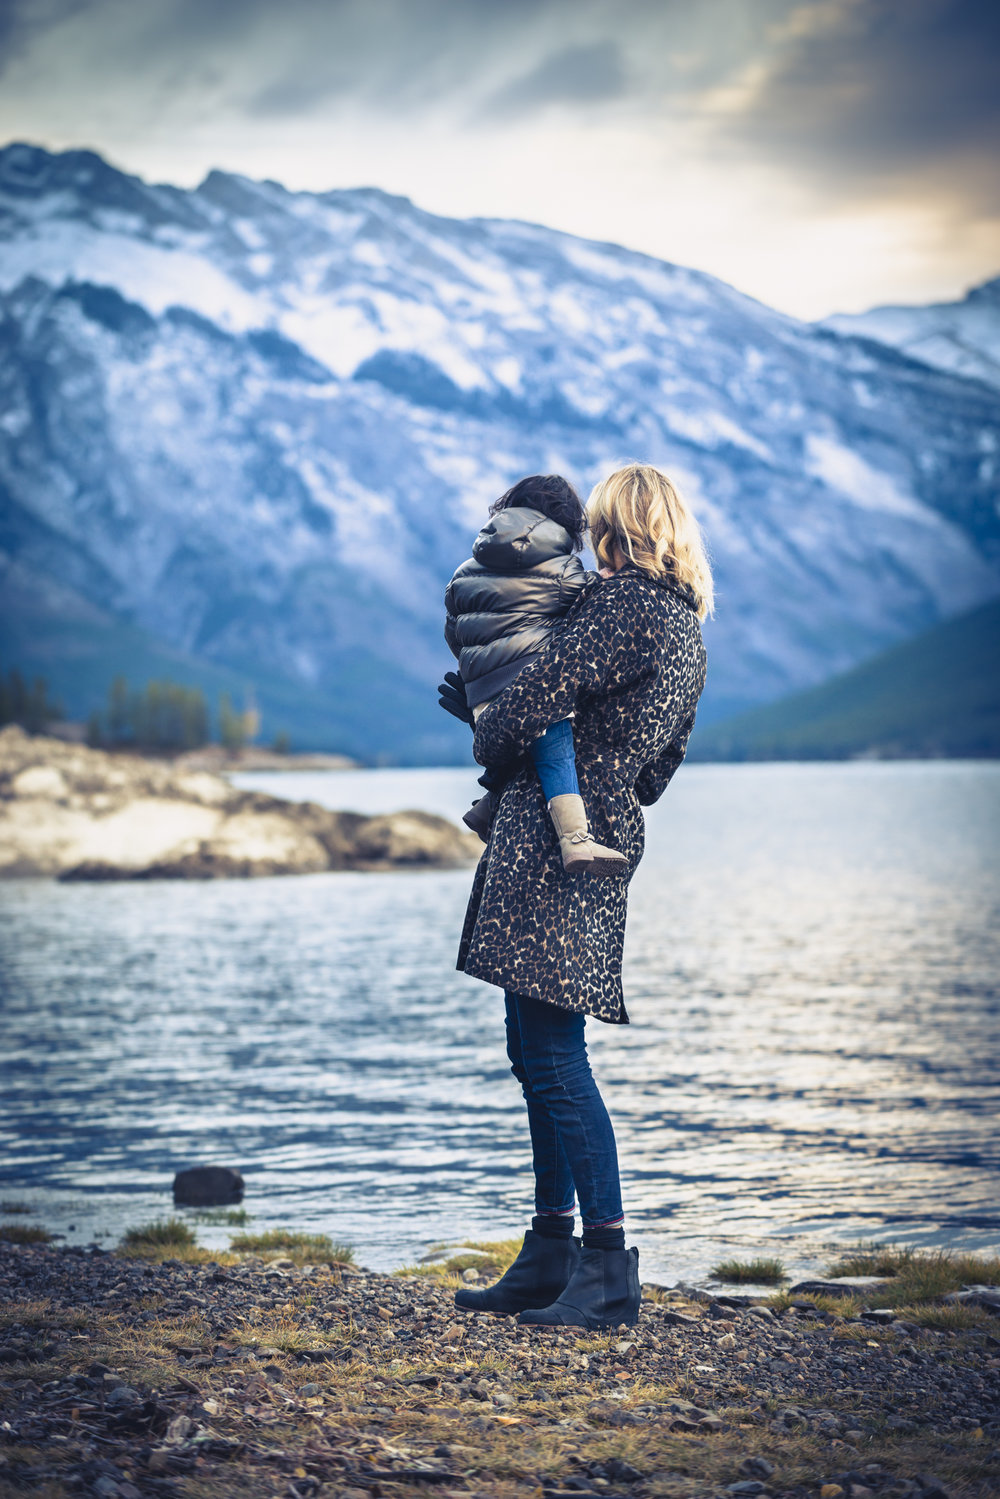 Rachel, Miraj & Charlotte's family session at Lake Minnewanka in Banff National Park.